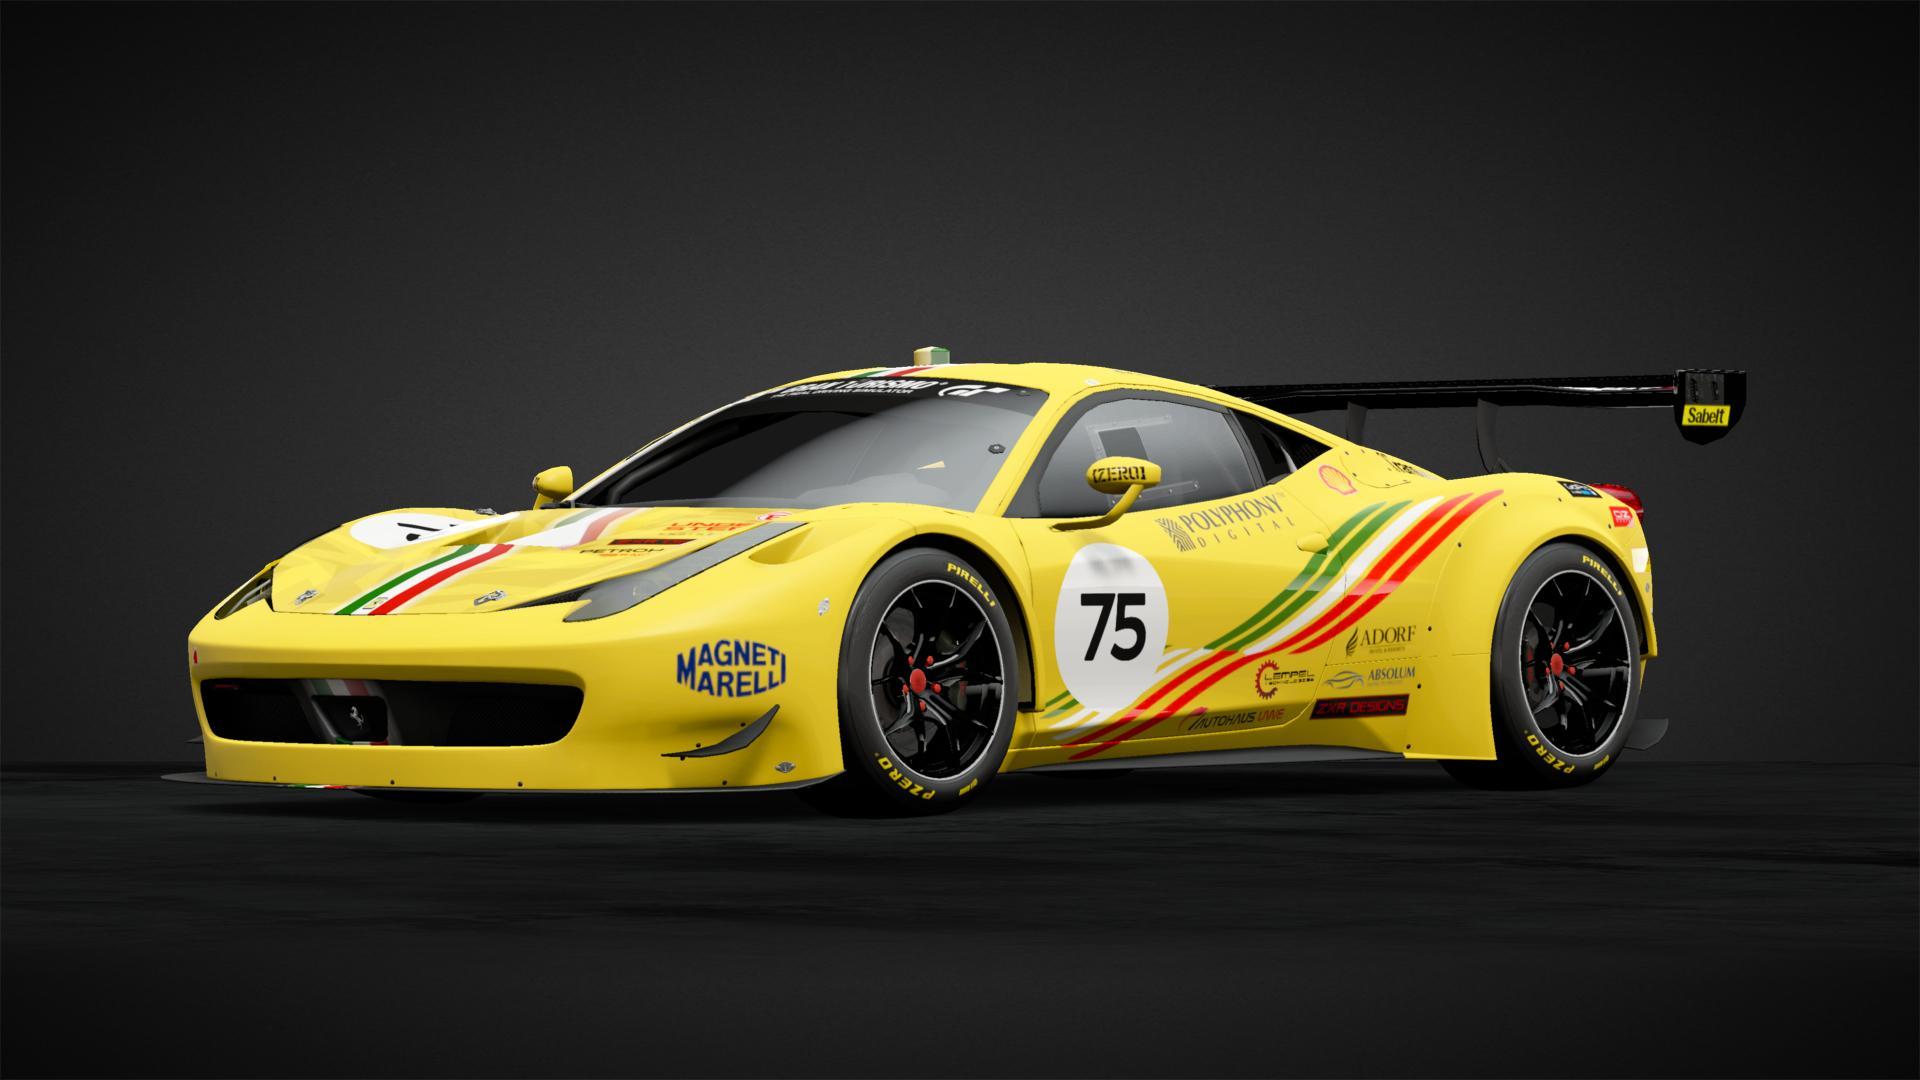 Ferrari 458 Italia Gt3 Yellow Car Livery By Bigdave S75 Community Gran Turismo Sport